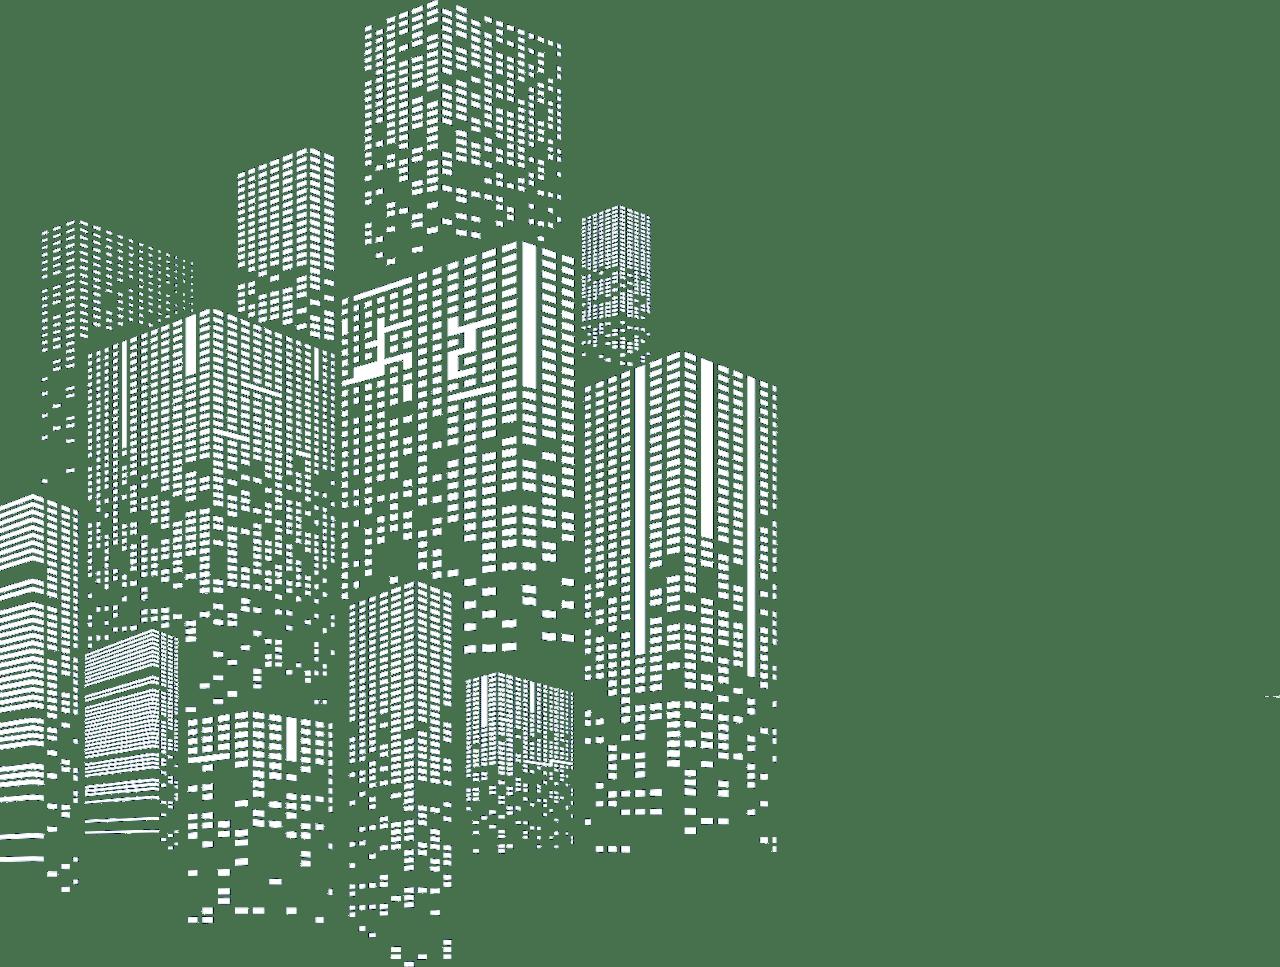 Building, Skyscraper, Grey, Rectangle